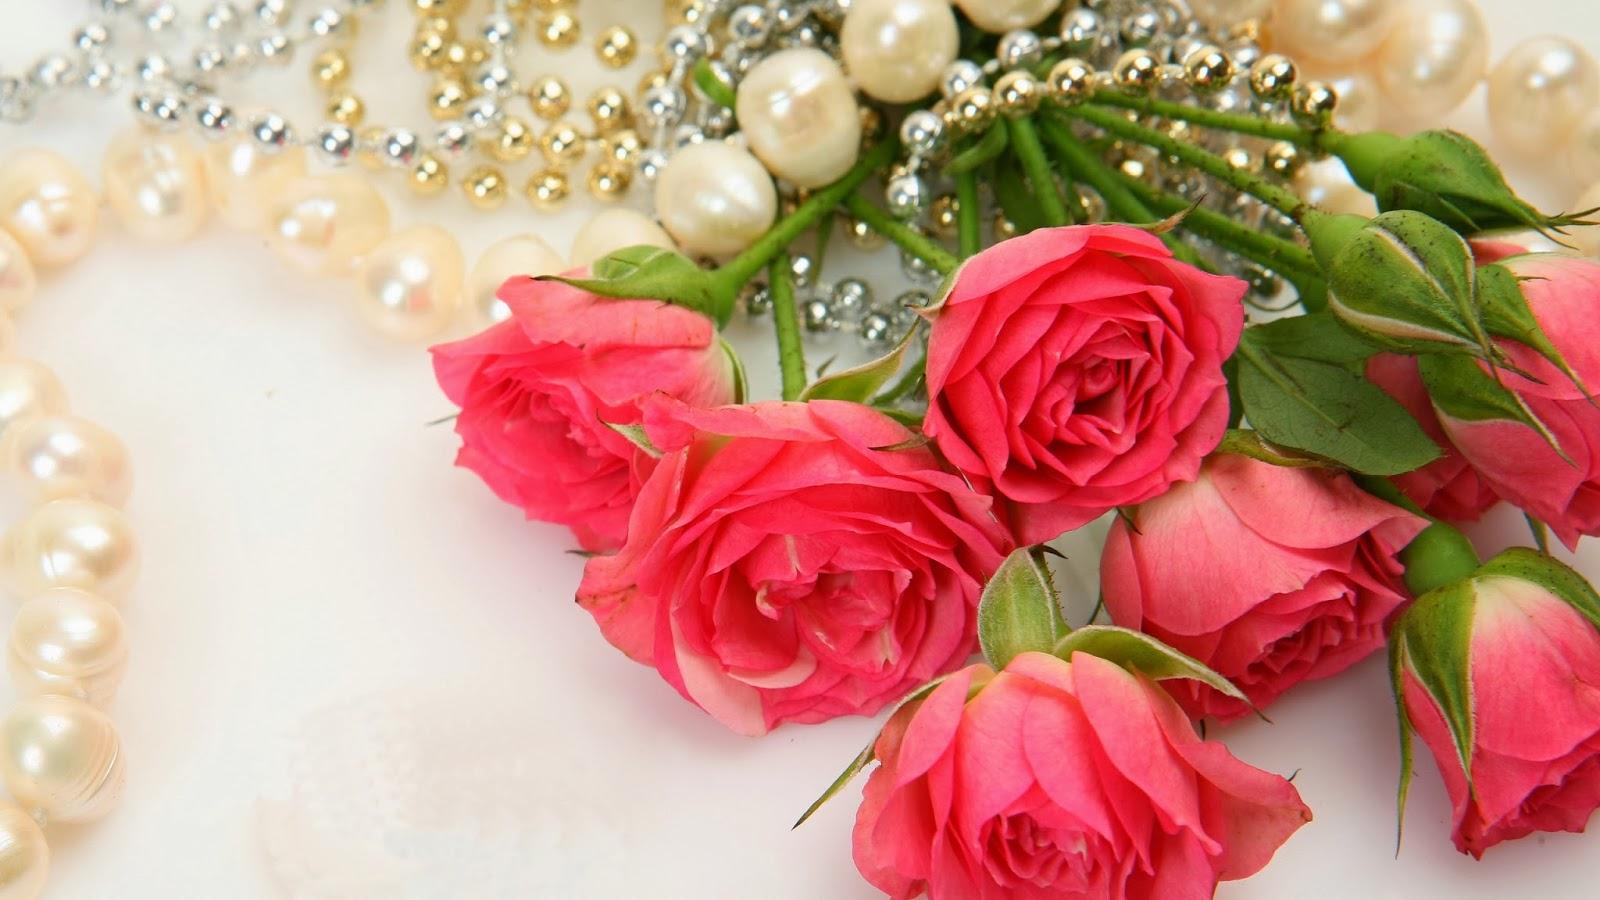 بالصور صور ورود روعه , lovely roses photos 3966 10